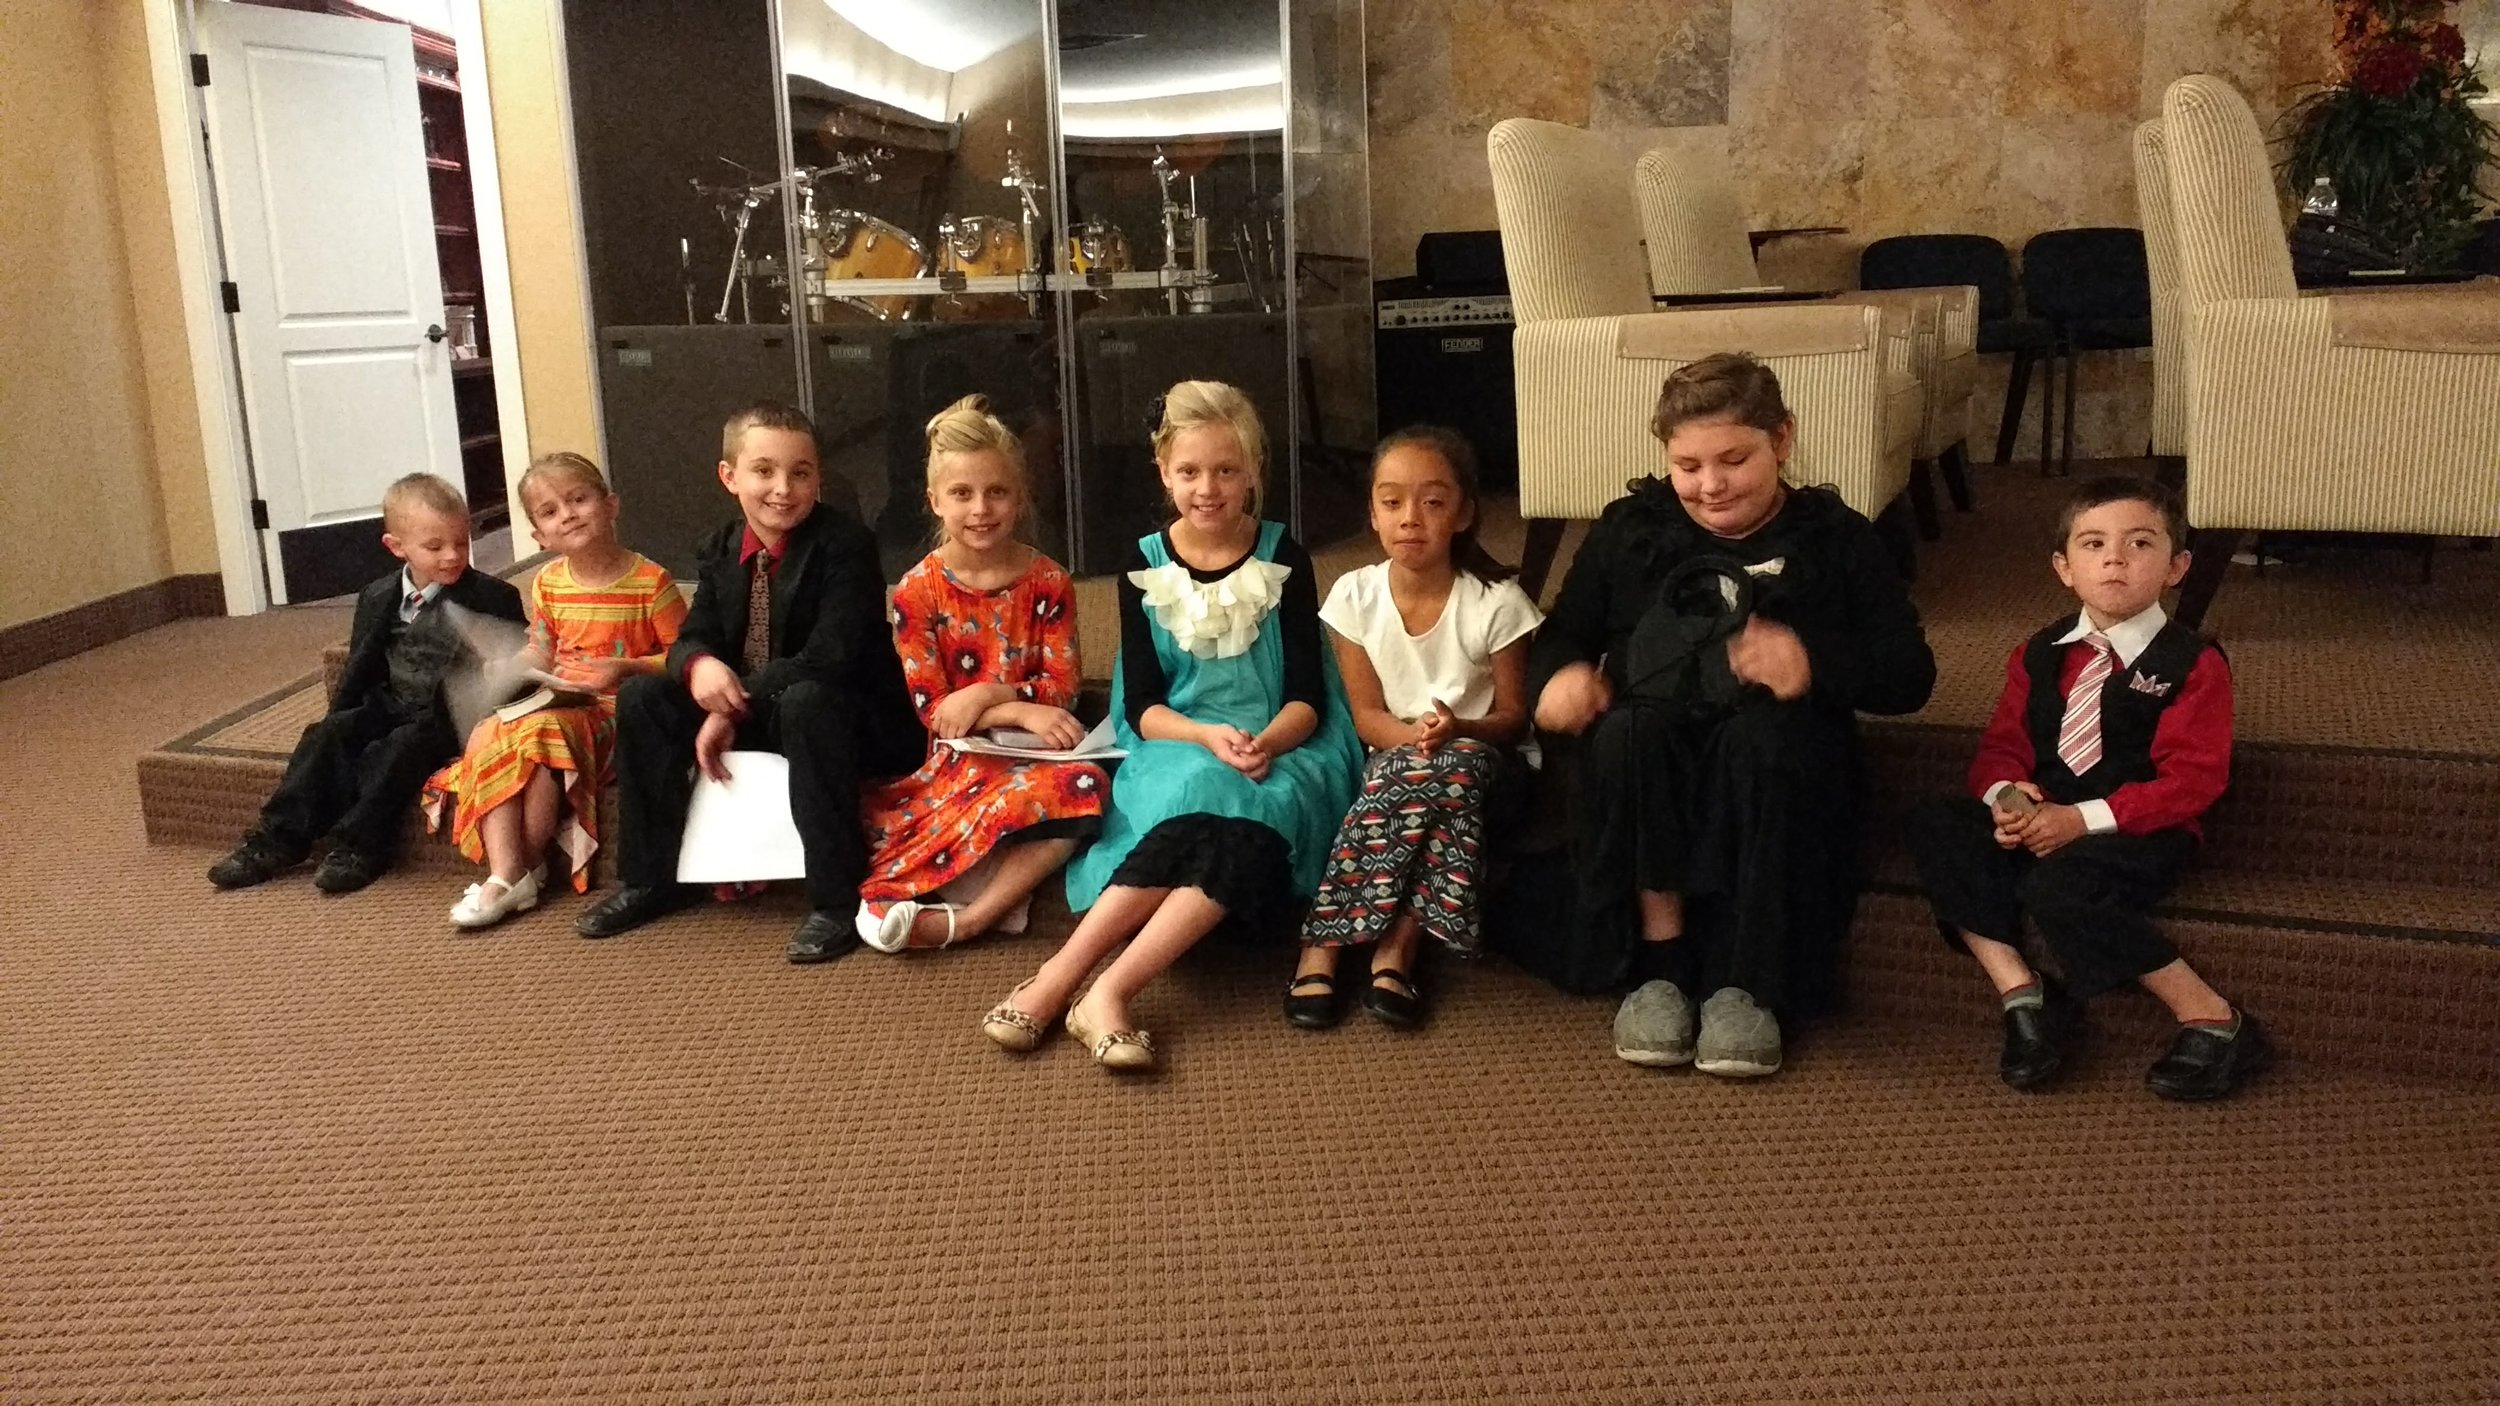 From left to right: Jordan, Megan, Dallas, Mandy, Emily, Espranza, Fantasia, Jared